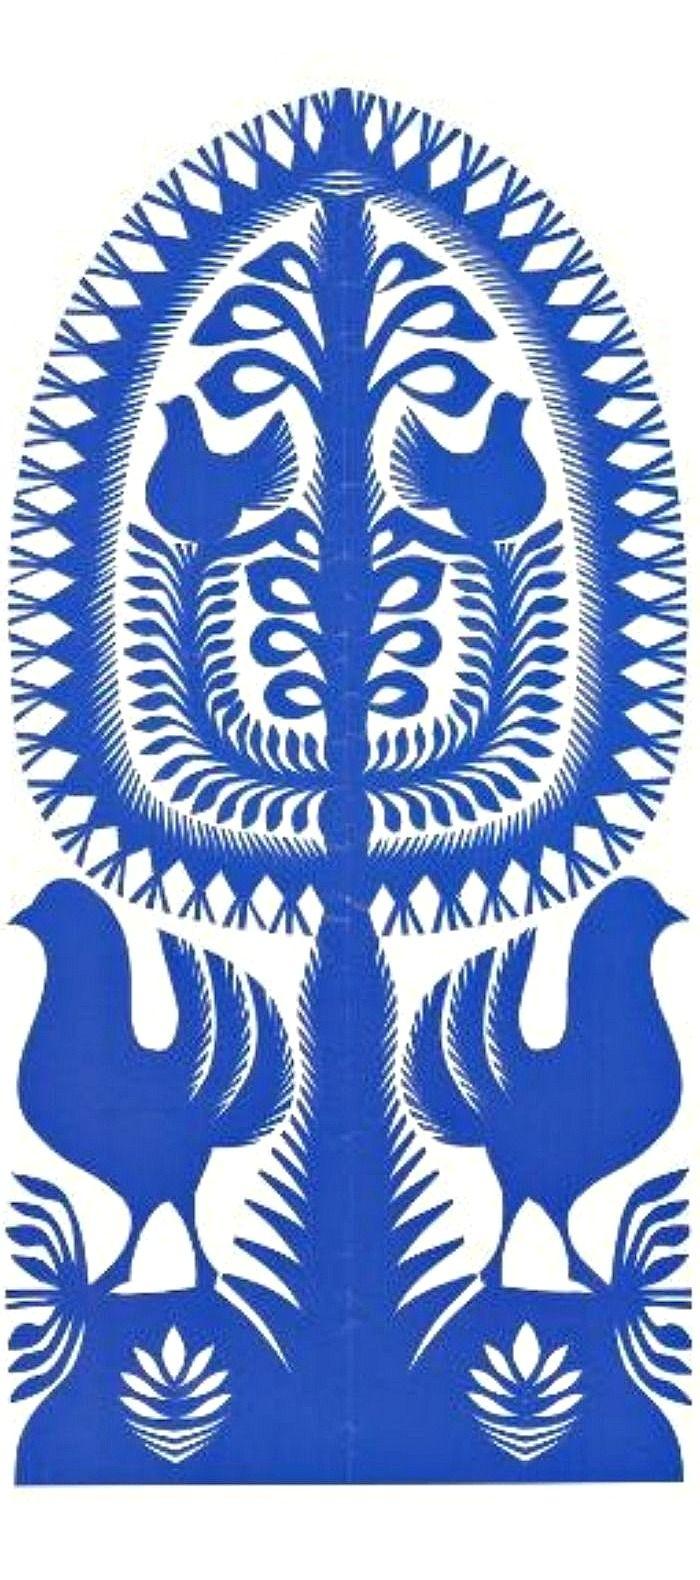 POLISH FOLK ART - Wycinanki - traditional papercut art from Poland ...